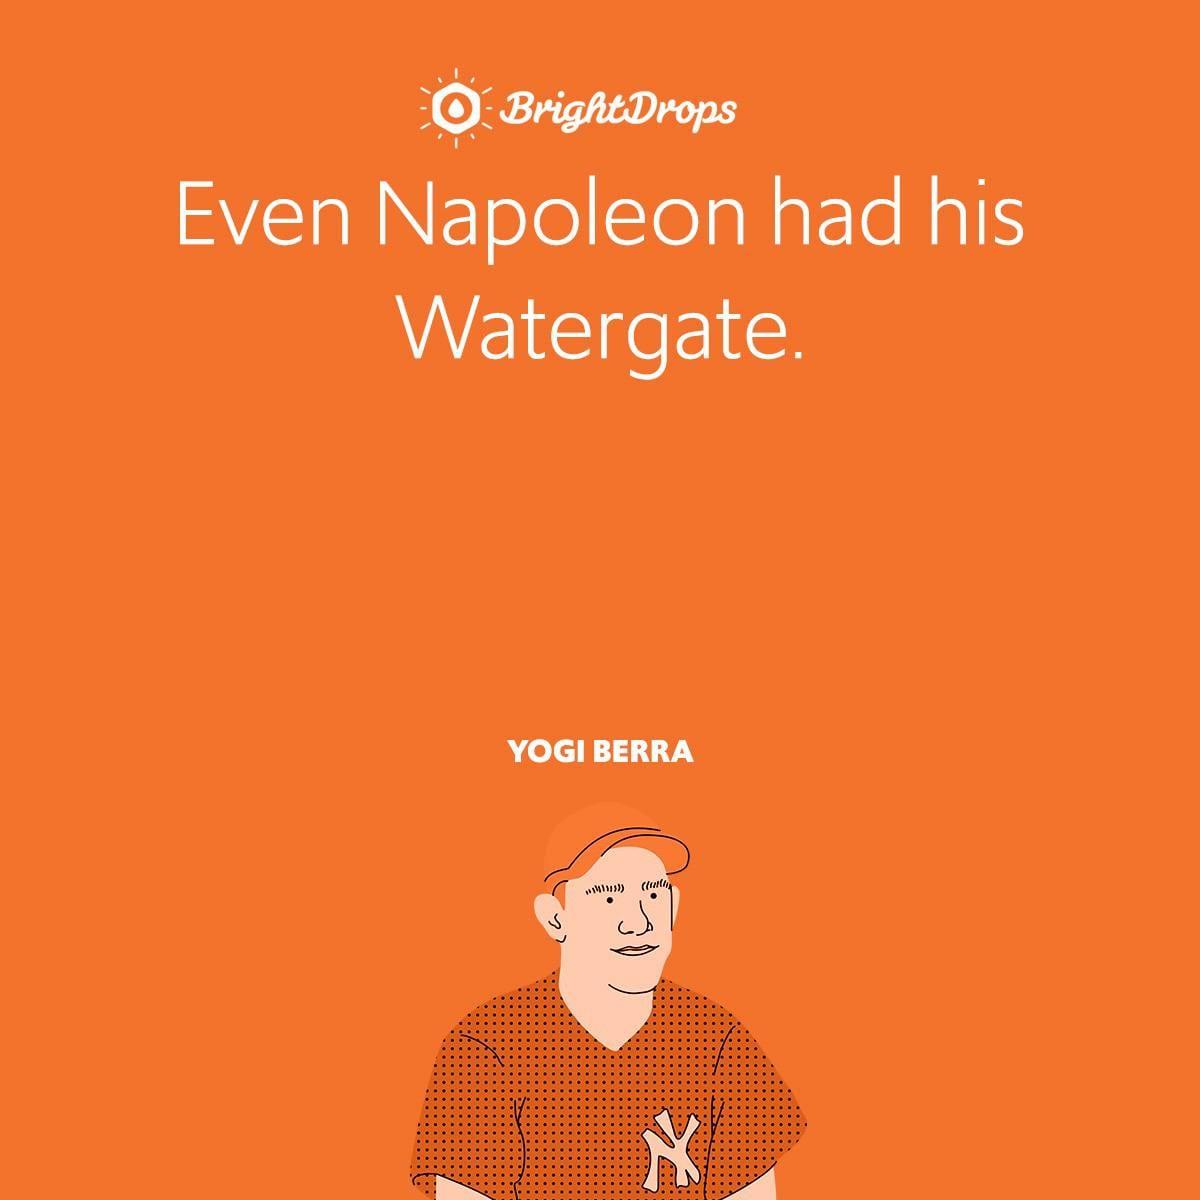 Even Napoleon had his Watergate.